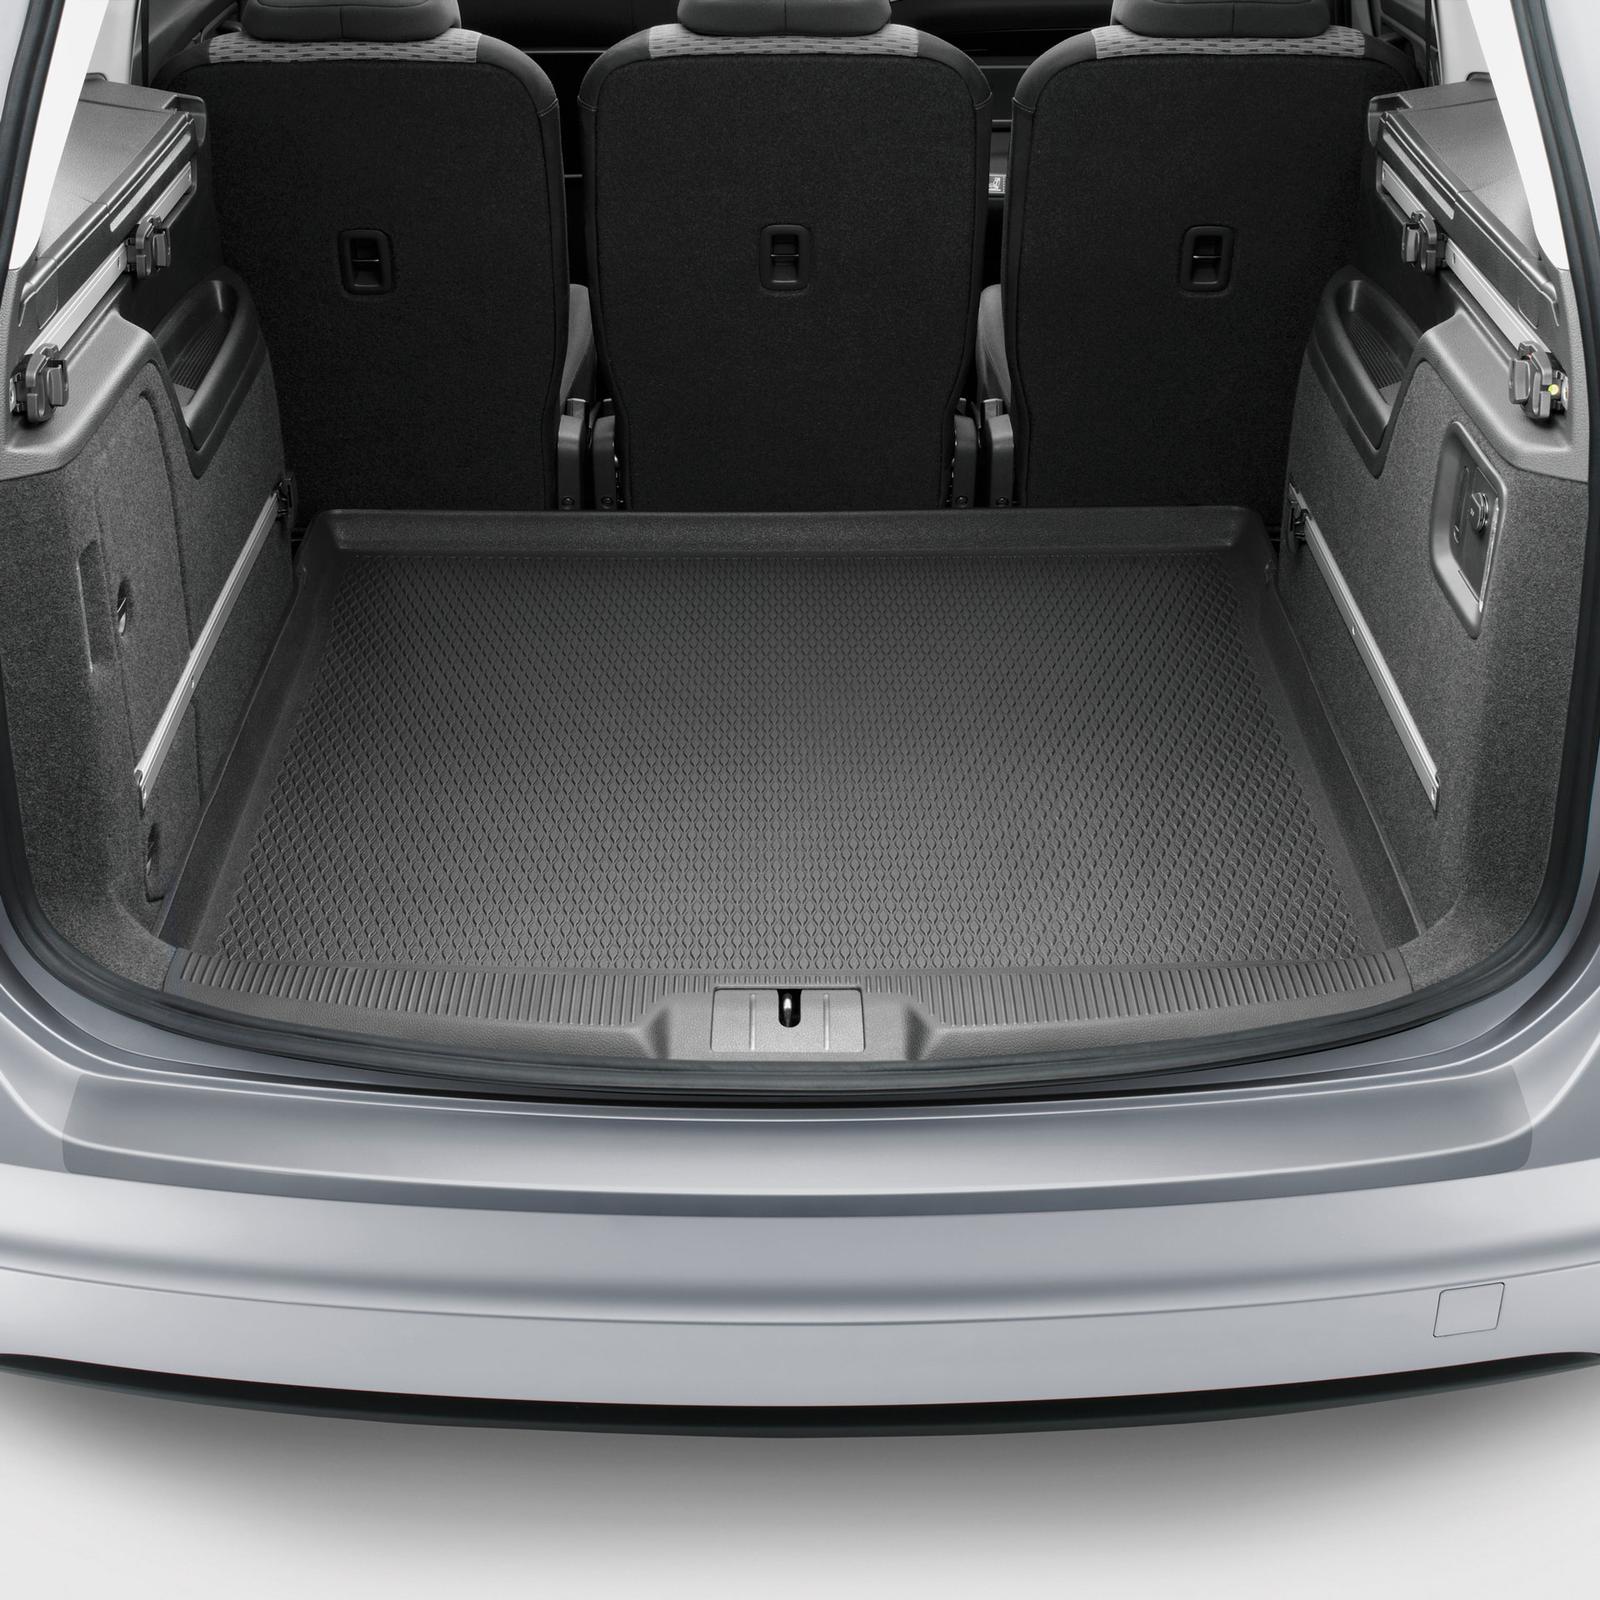 Volkswagen Ladekantenschutzfolie transparent Schutz Folie Sharan 7N 7N0061197A